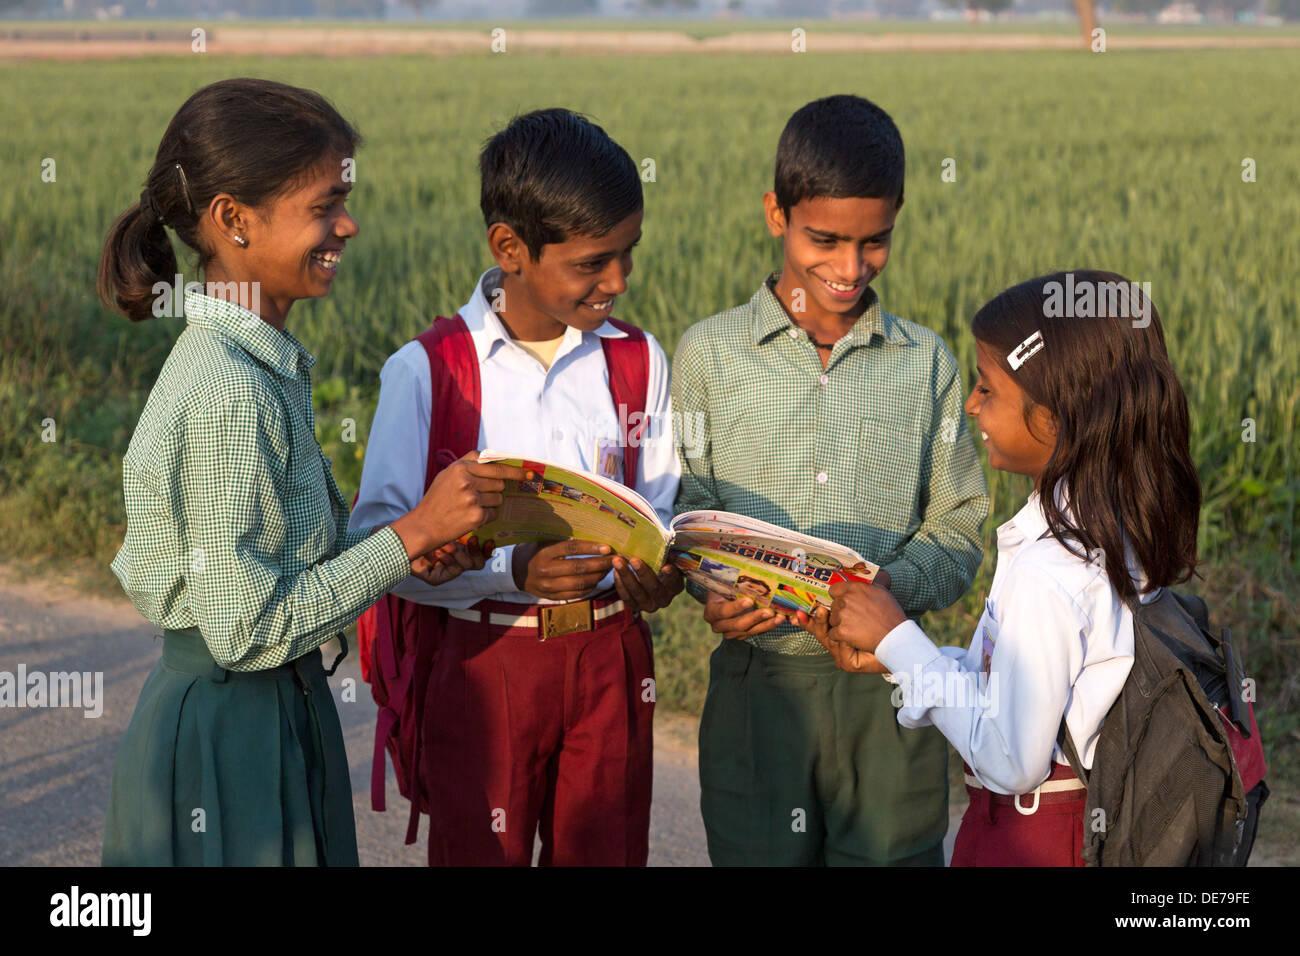 India, Uttar Pradesh, Agra, village children in school uniform looking at indian textbook - Stock Image